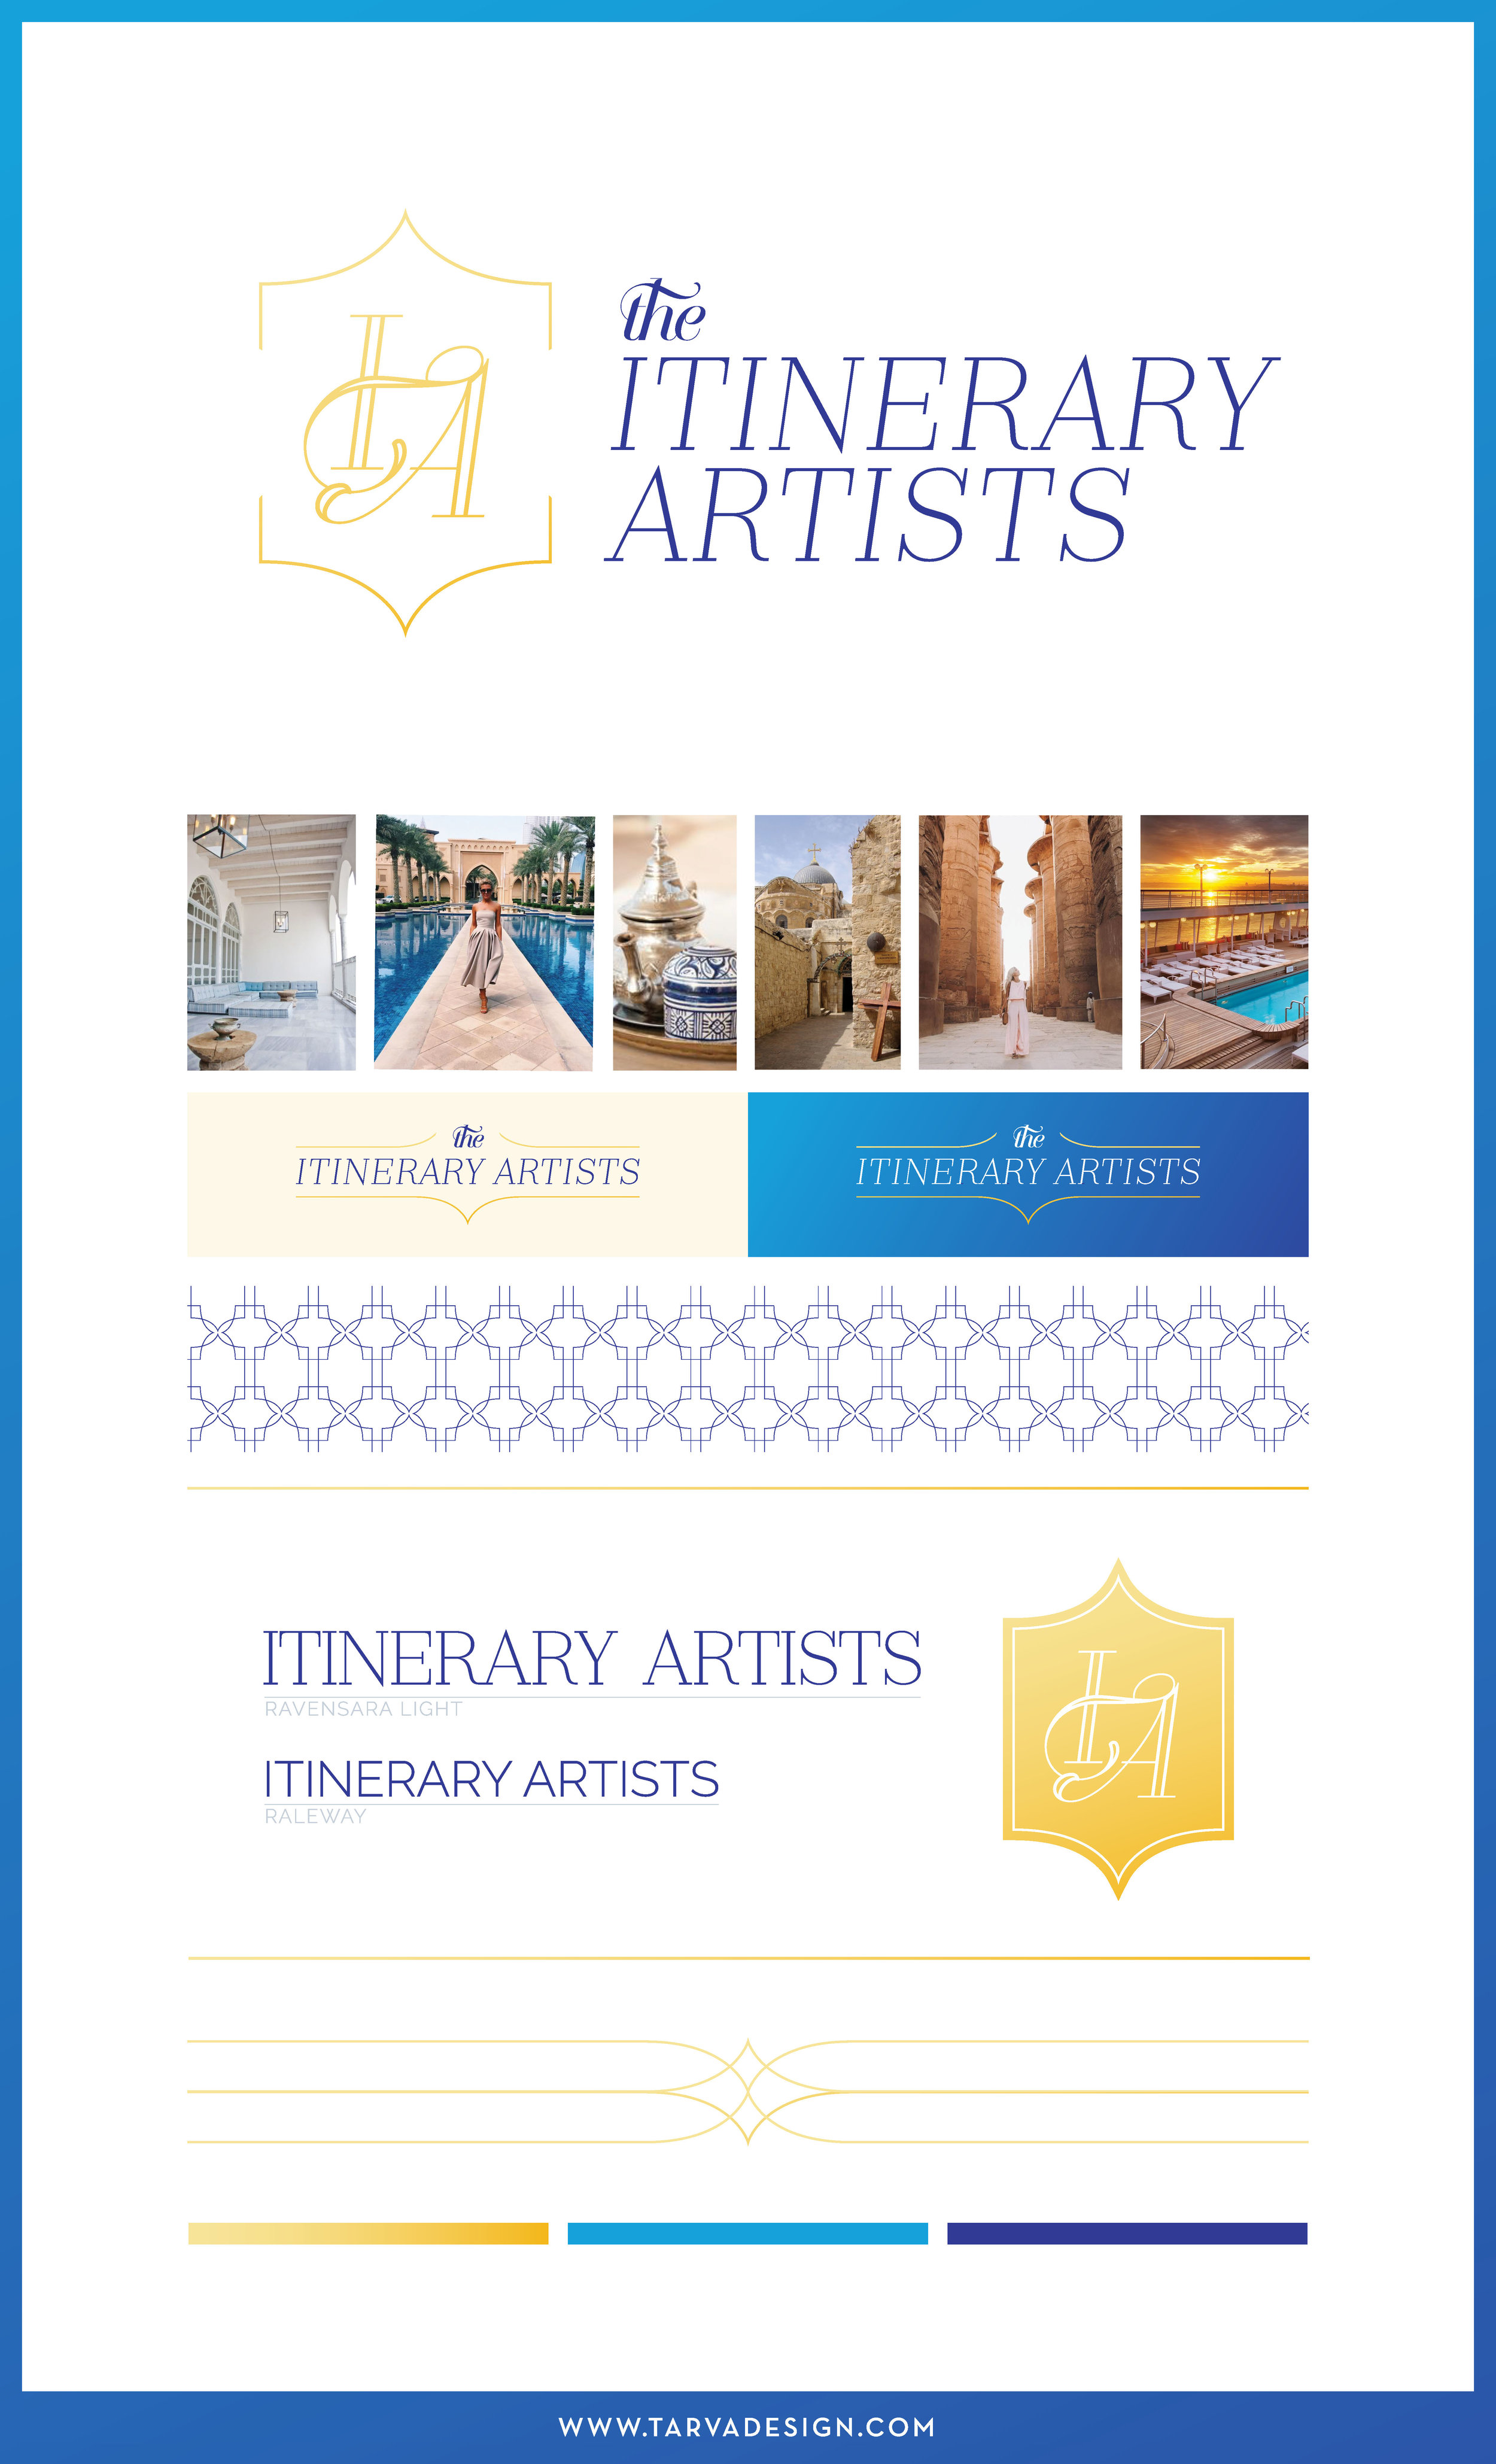 Tarva+Design+Studio_The+Itinerary+Artists_Brand+Style.jpg